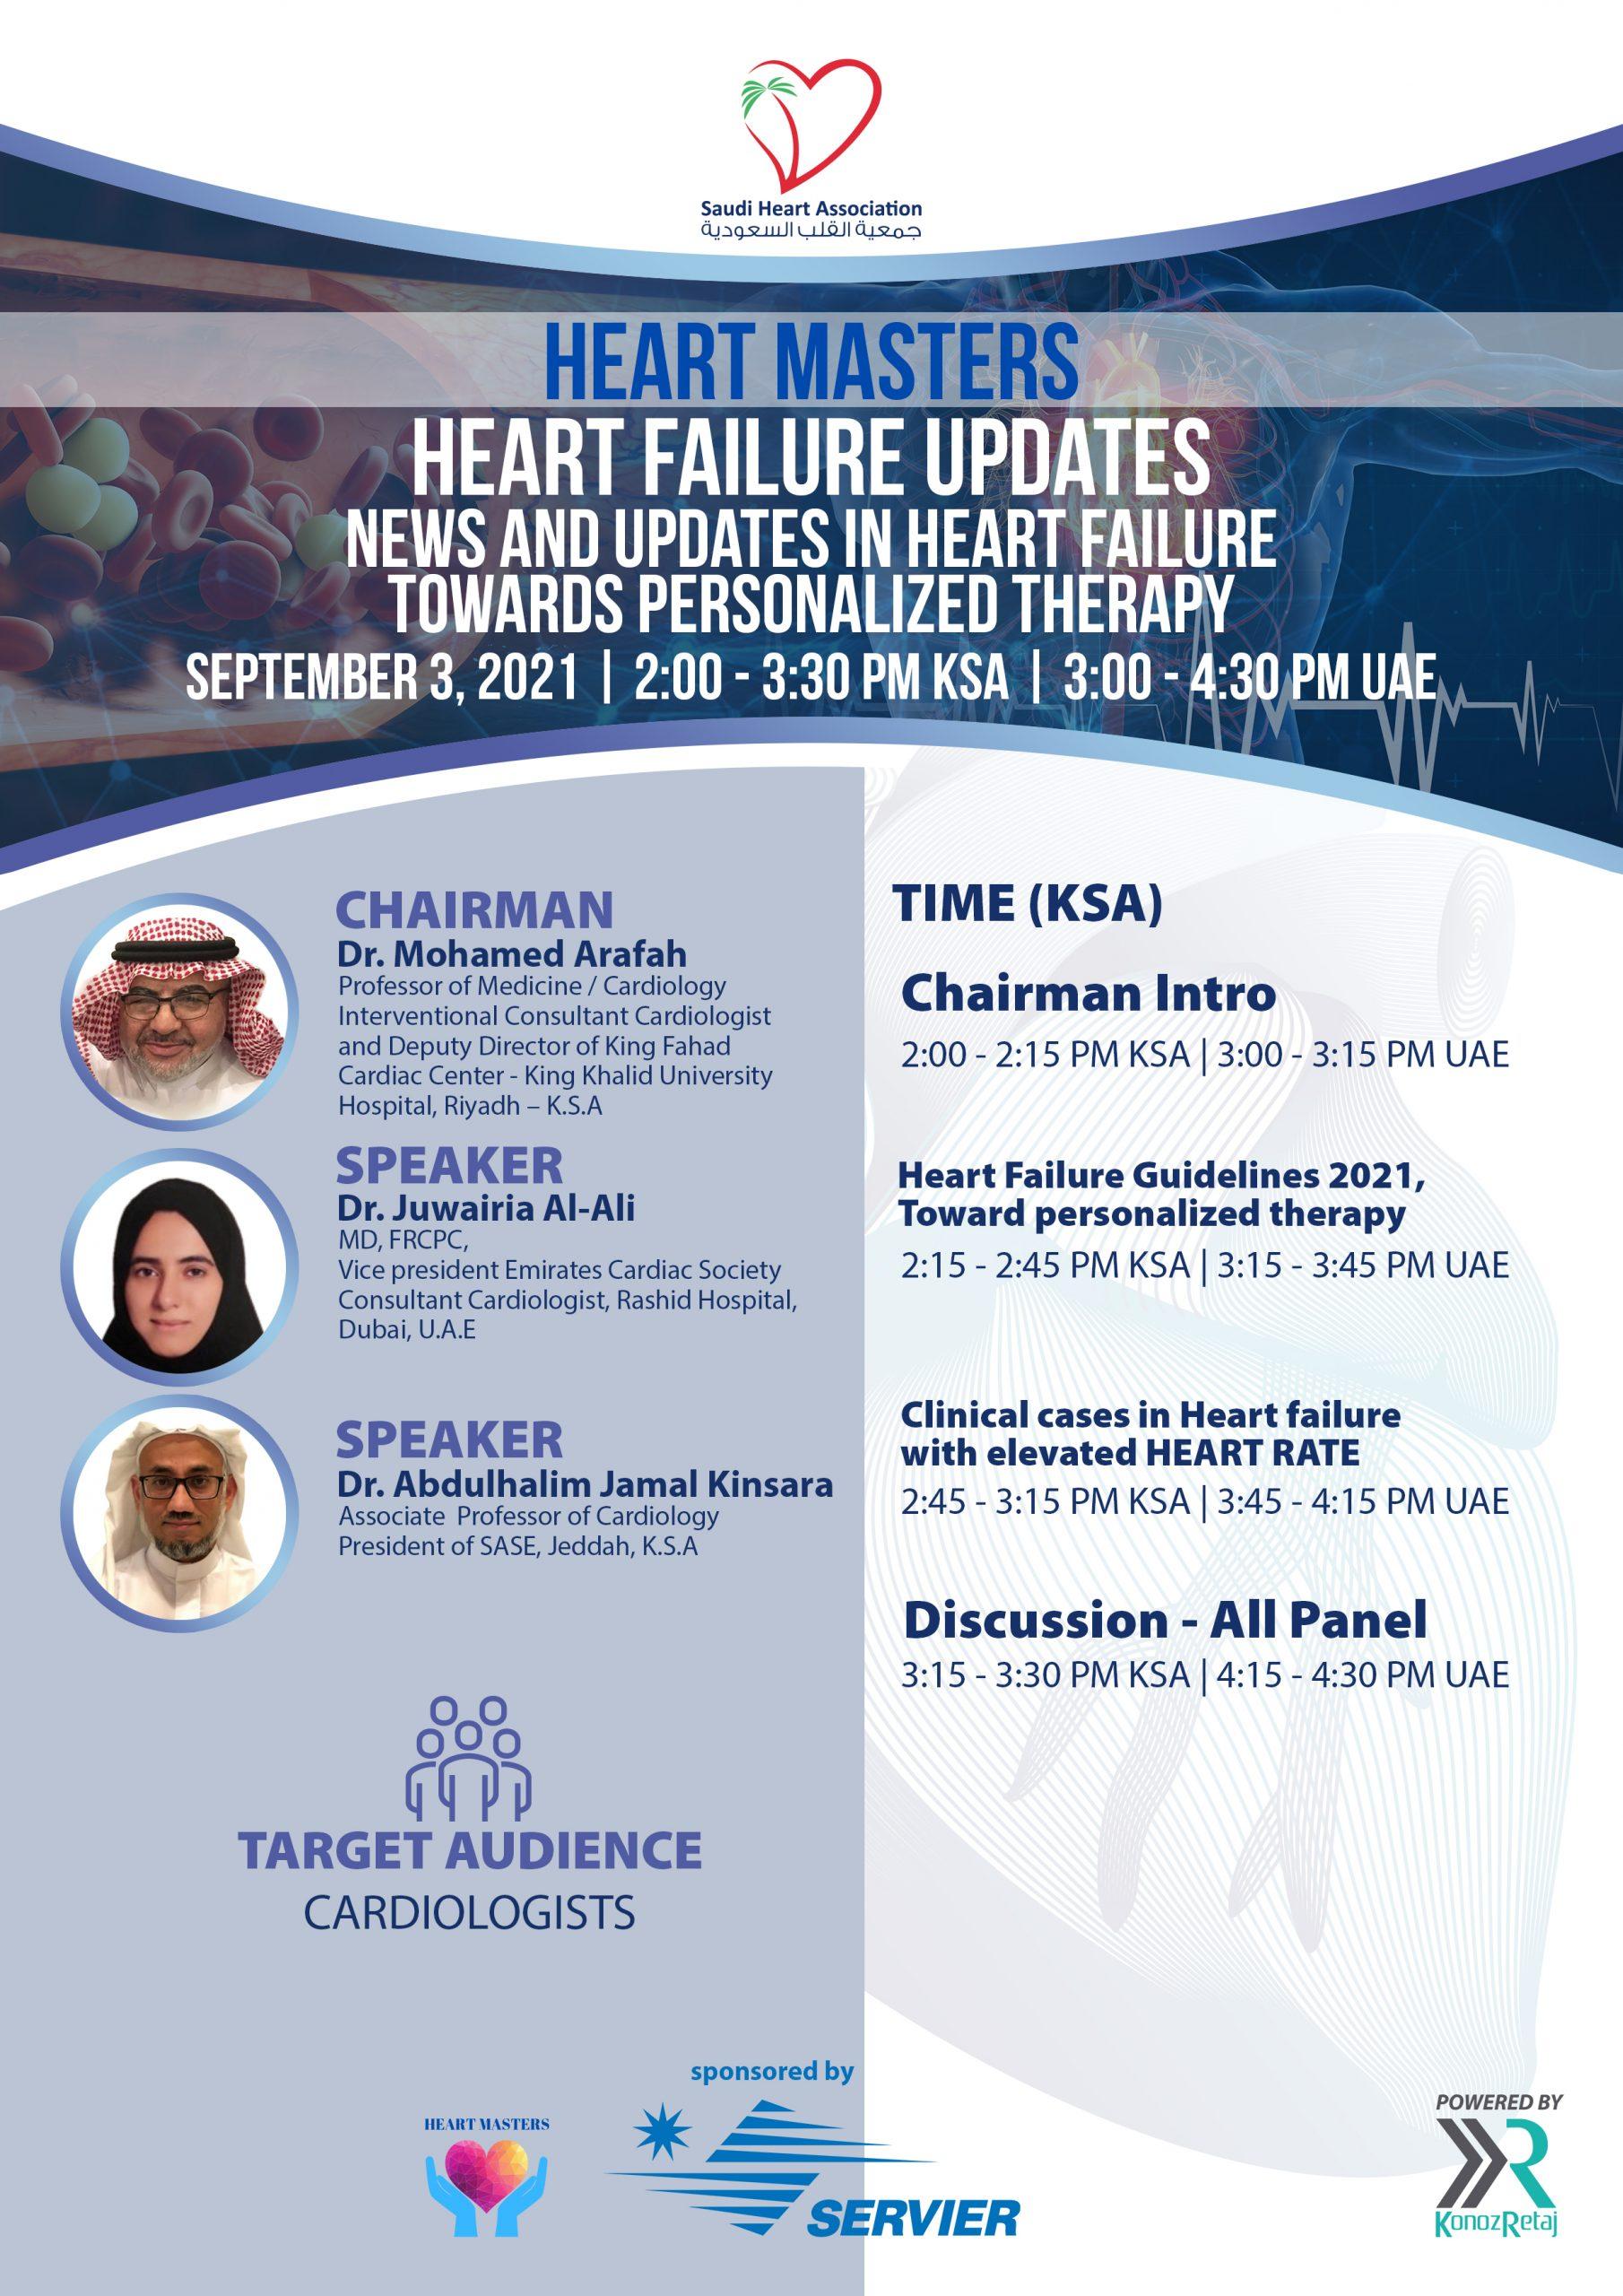 HEART MASTERS | HEART FAILURE UPDATES